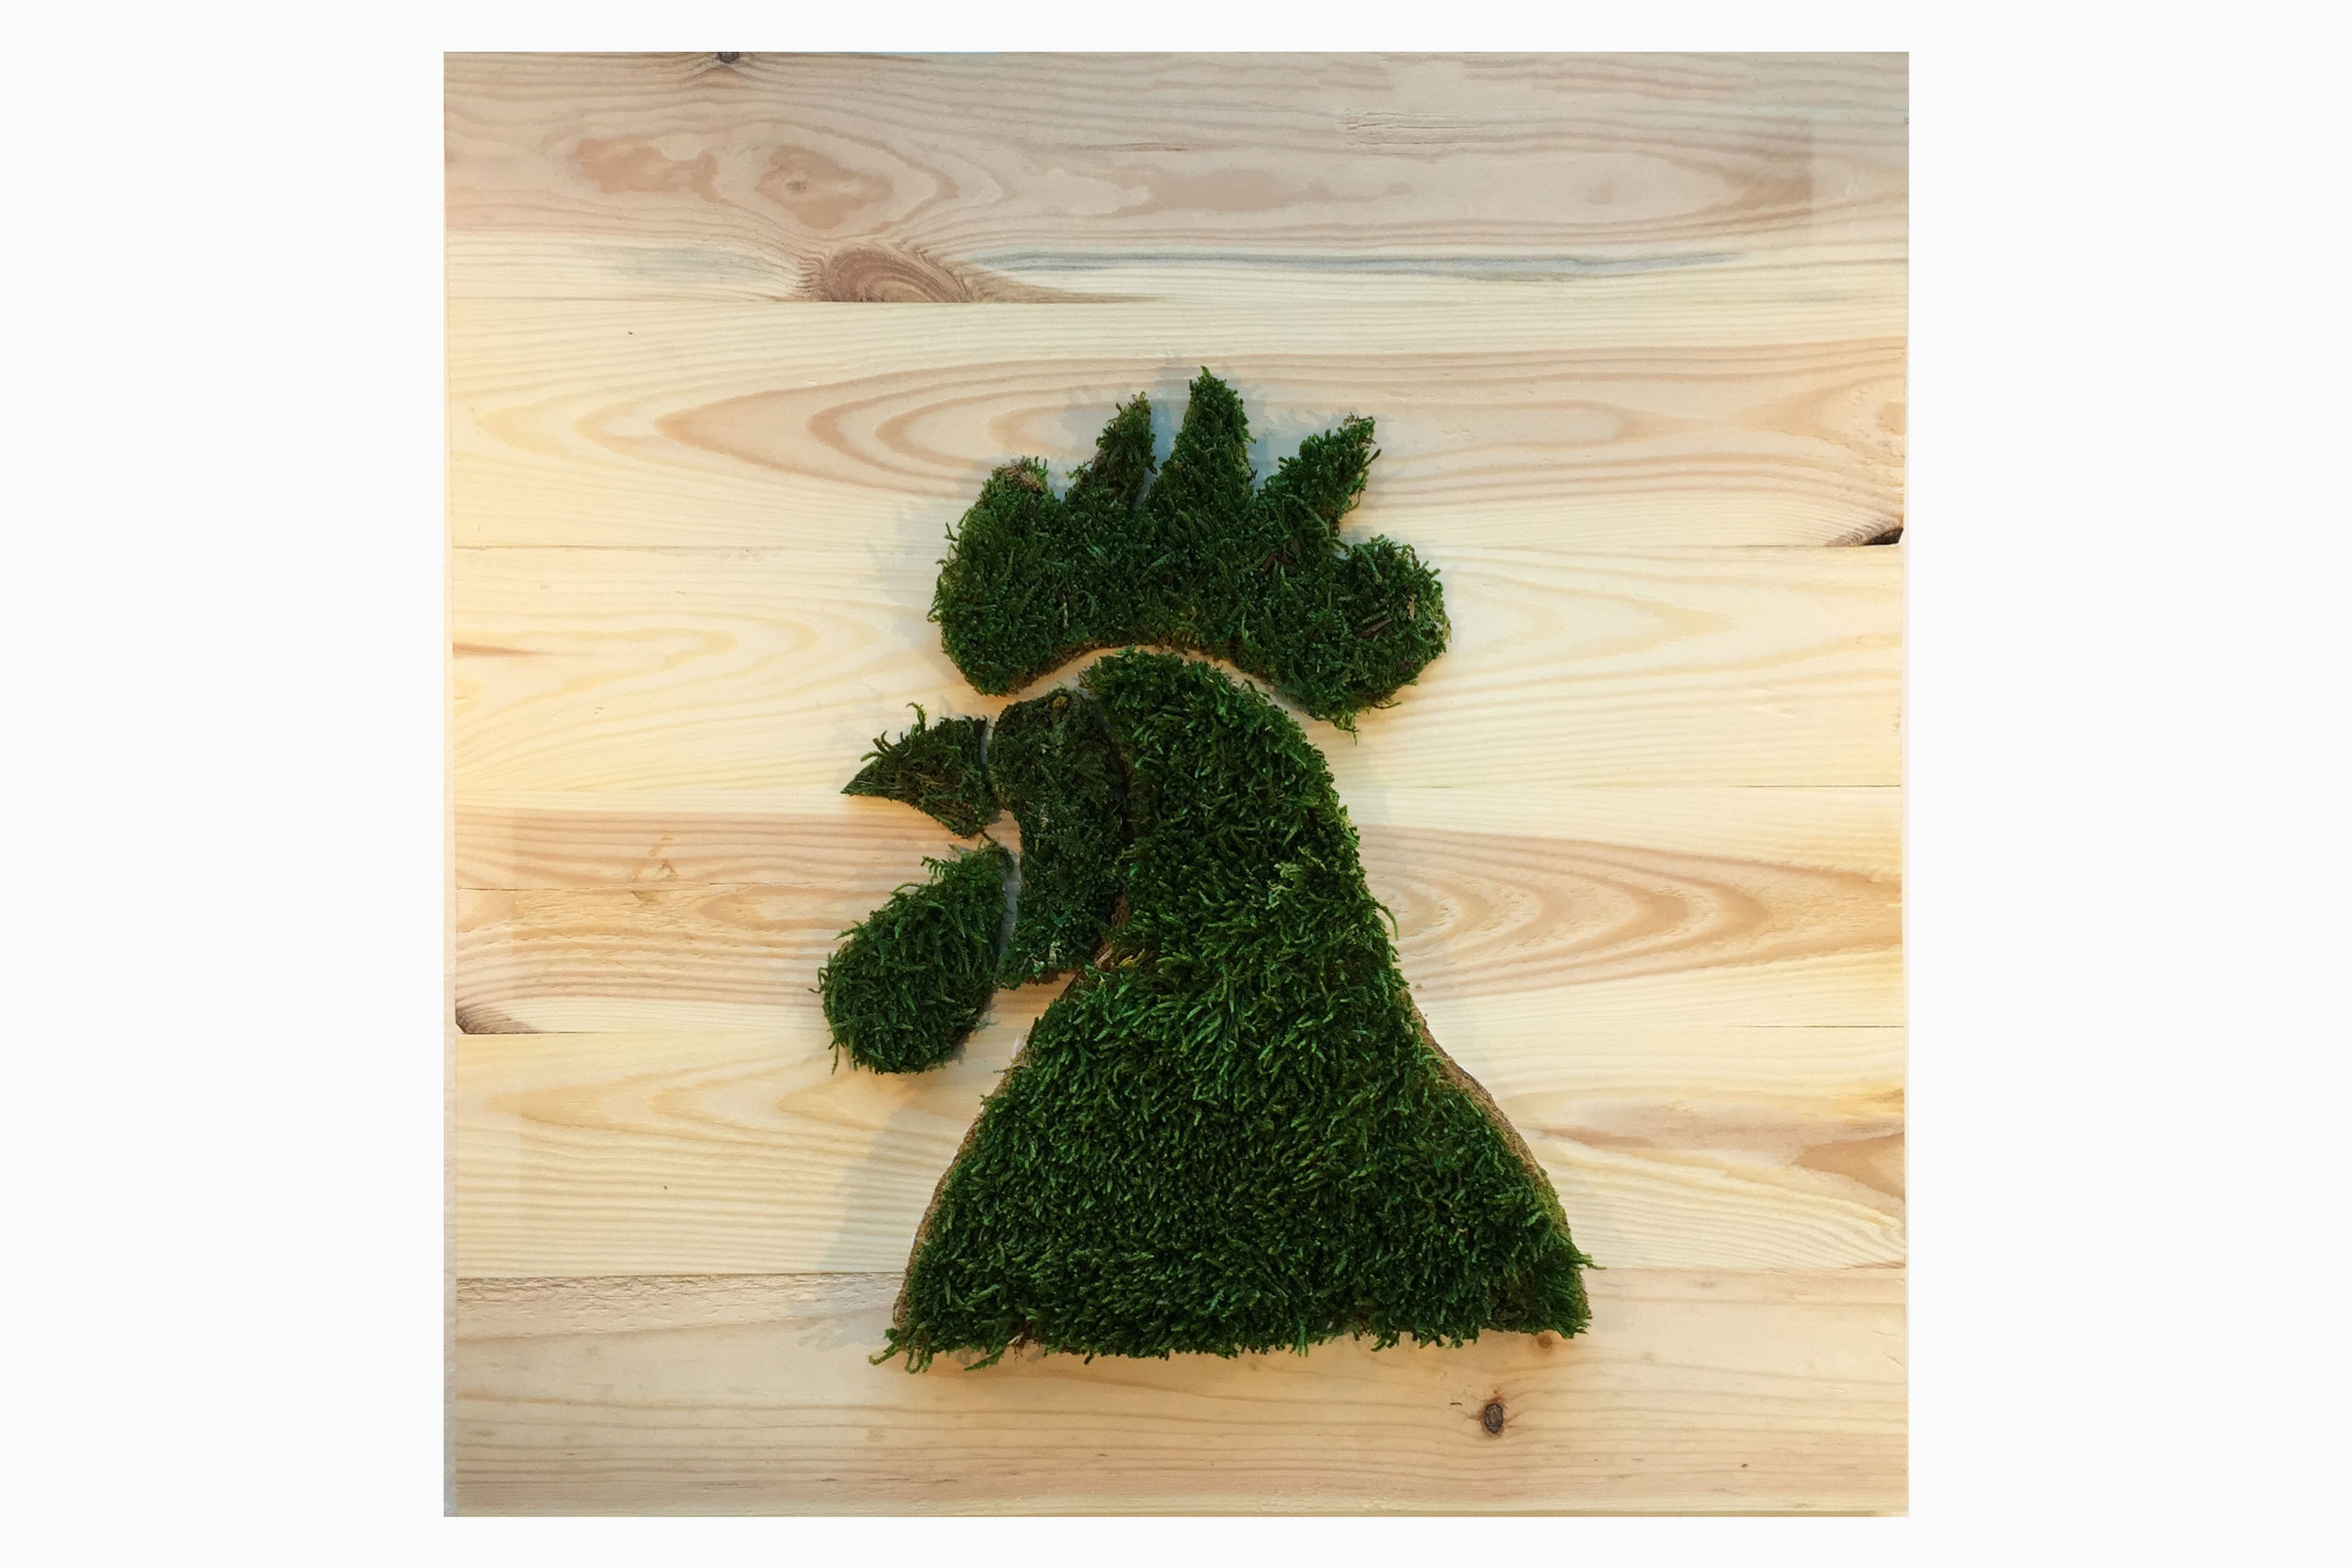 cadre-vegetal-coq-planche-hoai 2.jpg